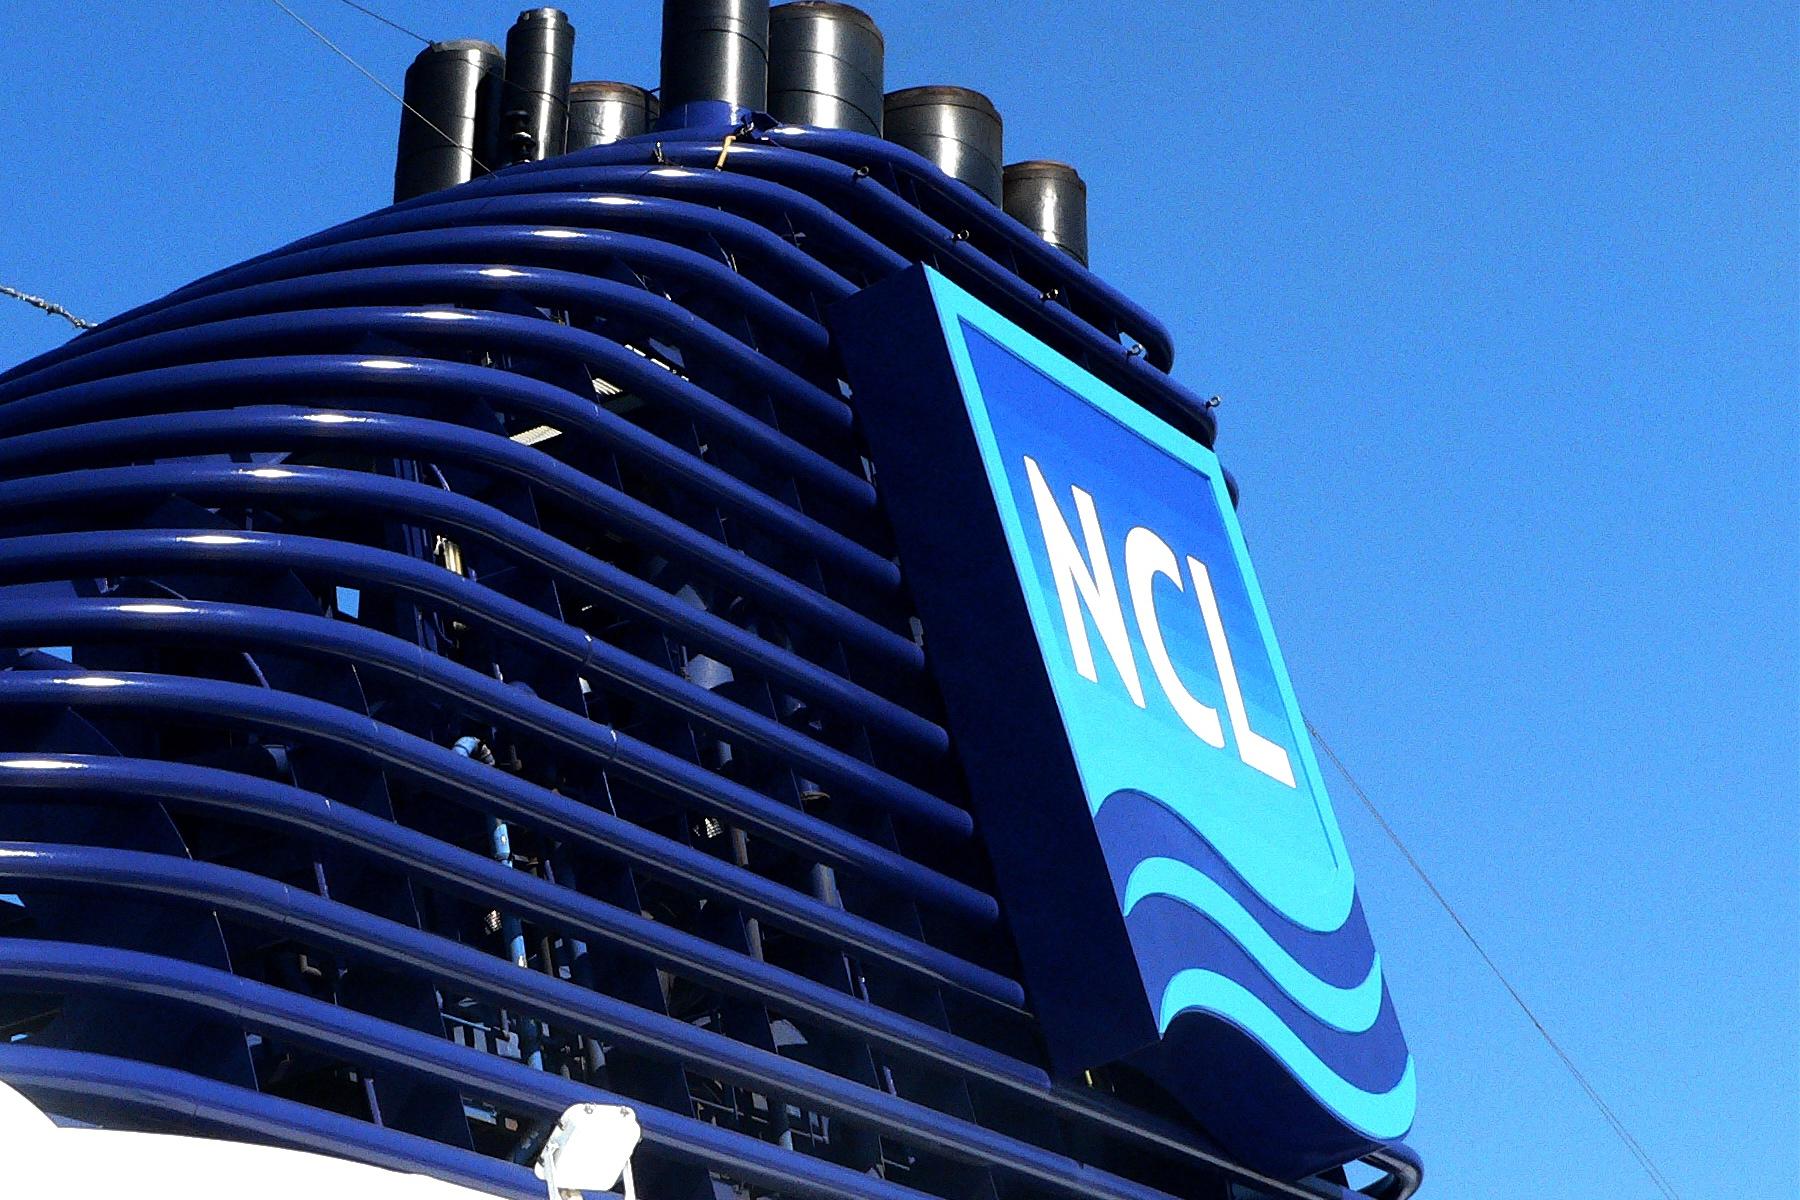 Projetc Leonardo in arrivo sei nuove navi Norwegian Cruise Line